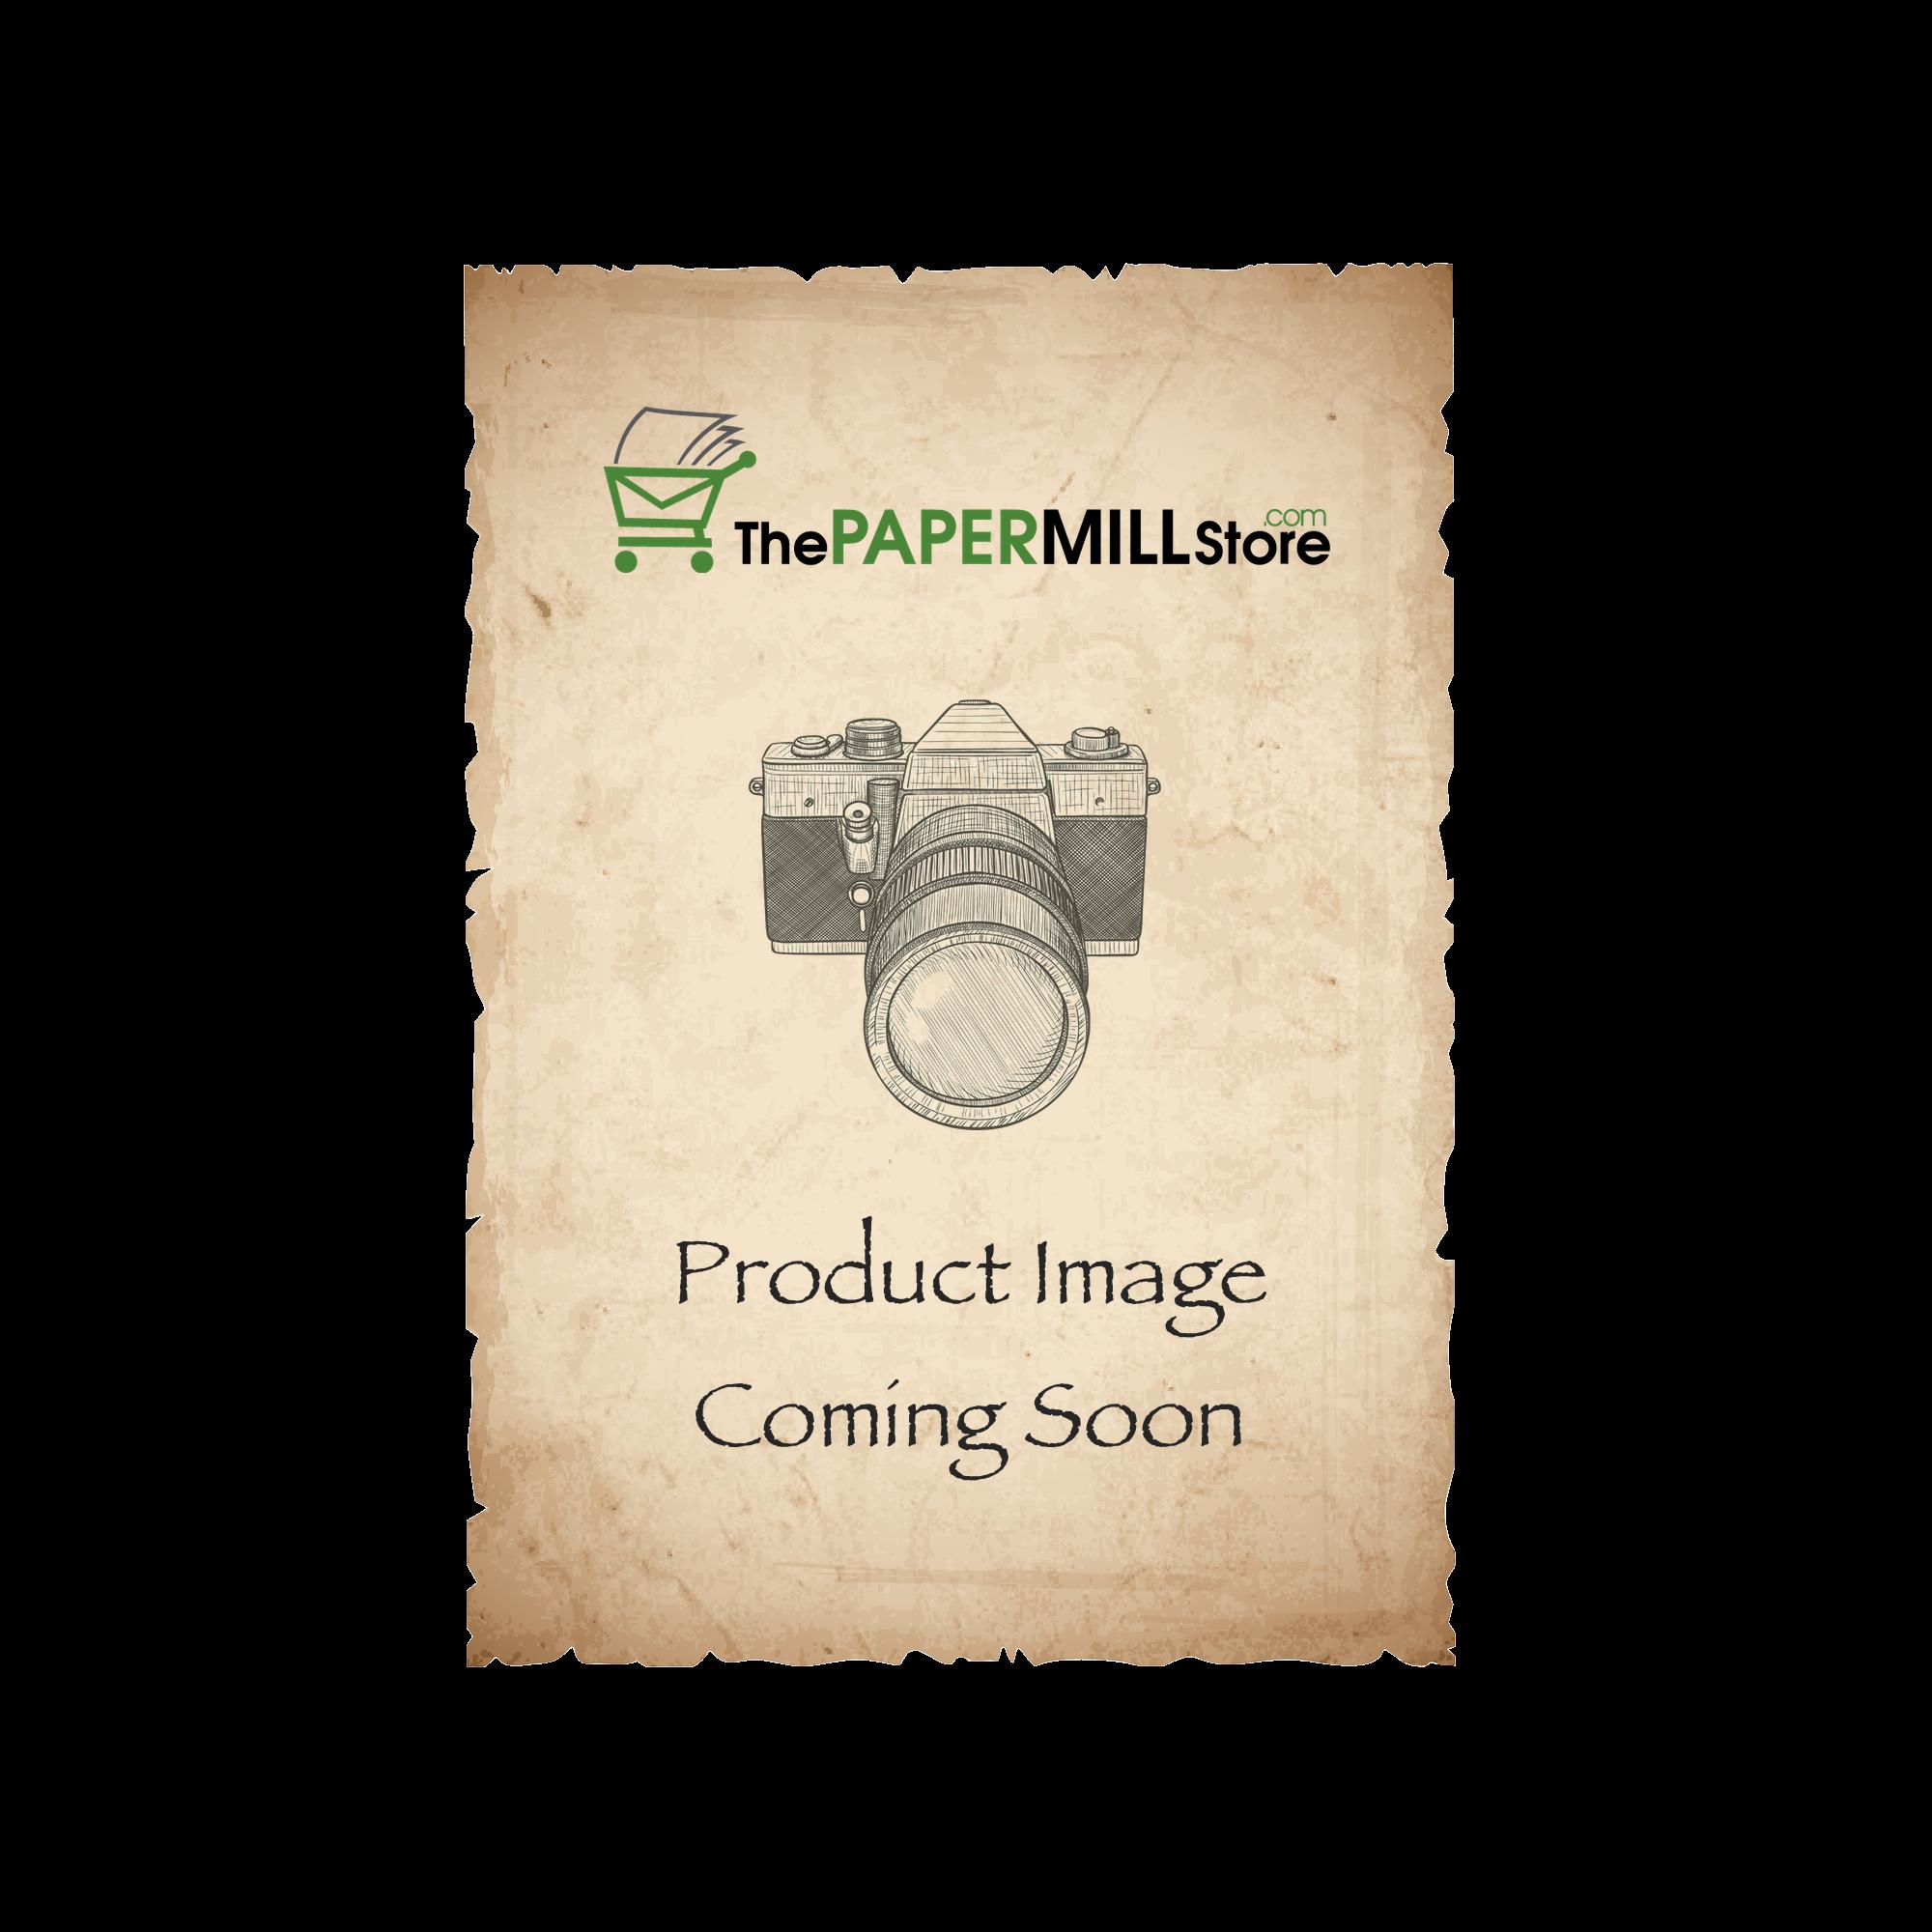 Strathmore Premium Wove Desert Haze Envelopes - A2 Square Flap (4 3/8 x 5 3/4) 70 lb Text Wove  30% Recycled 250 per Box